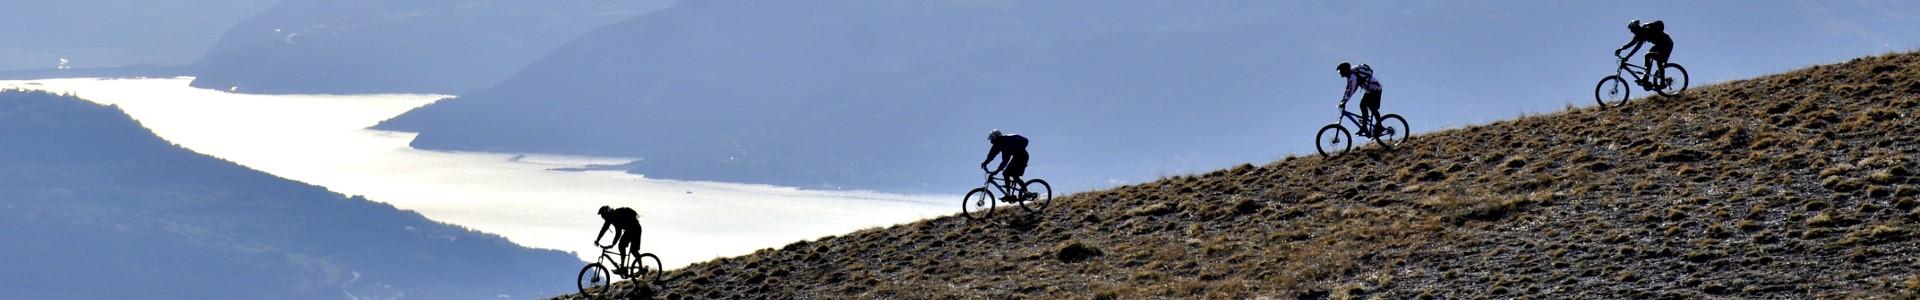 t-ti-re-vtt-cyclisme-3582